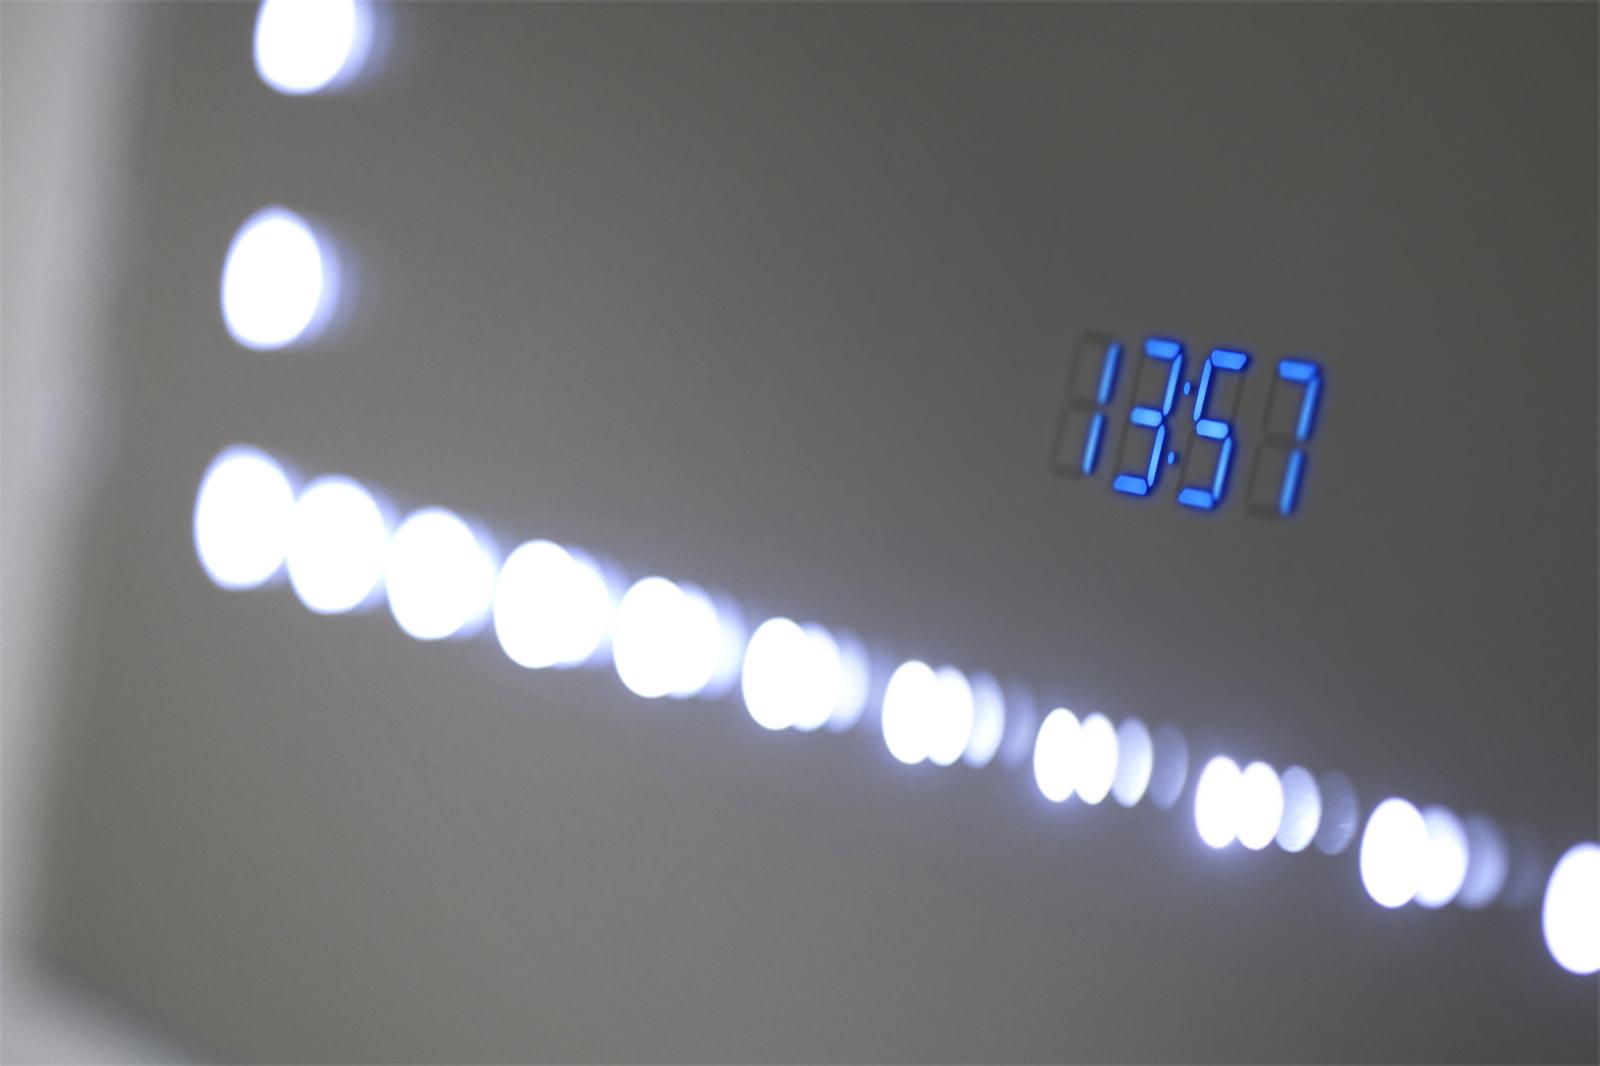 badspiegel mit uhr rgb beleuchtung heizung sensor rasiersteckdose k189rgb ebay. Black Bedroom Furniture Sets. Home Design Ideas